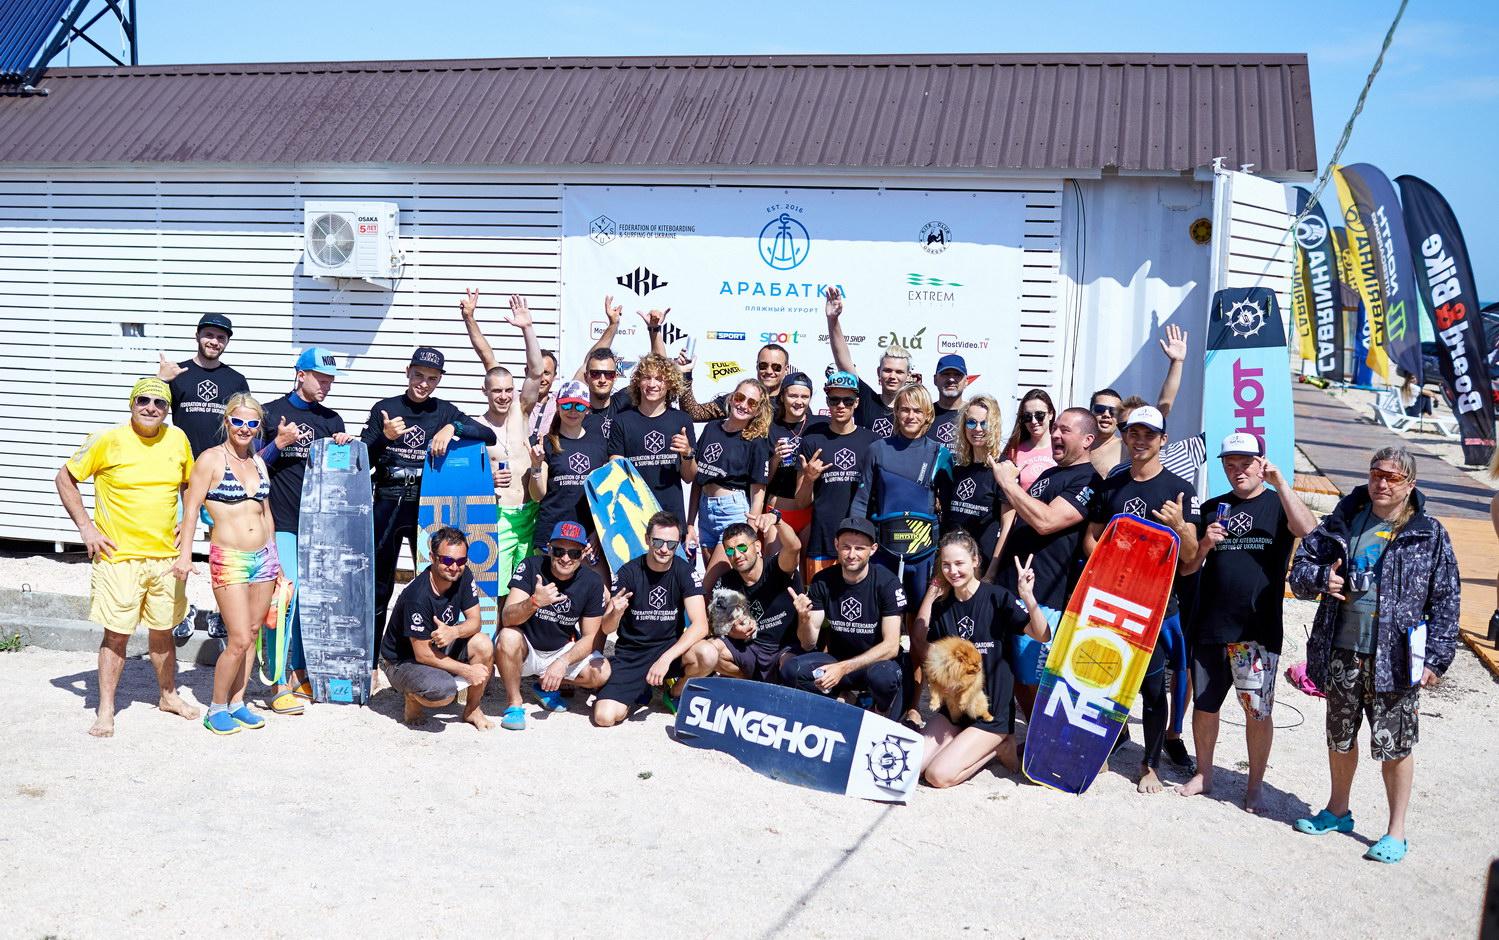 Кубок Украины по кайтбордингу: девушки, море, солнце и спорт